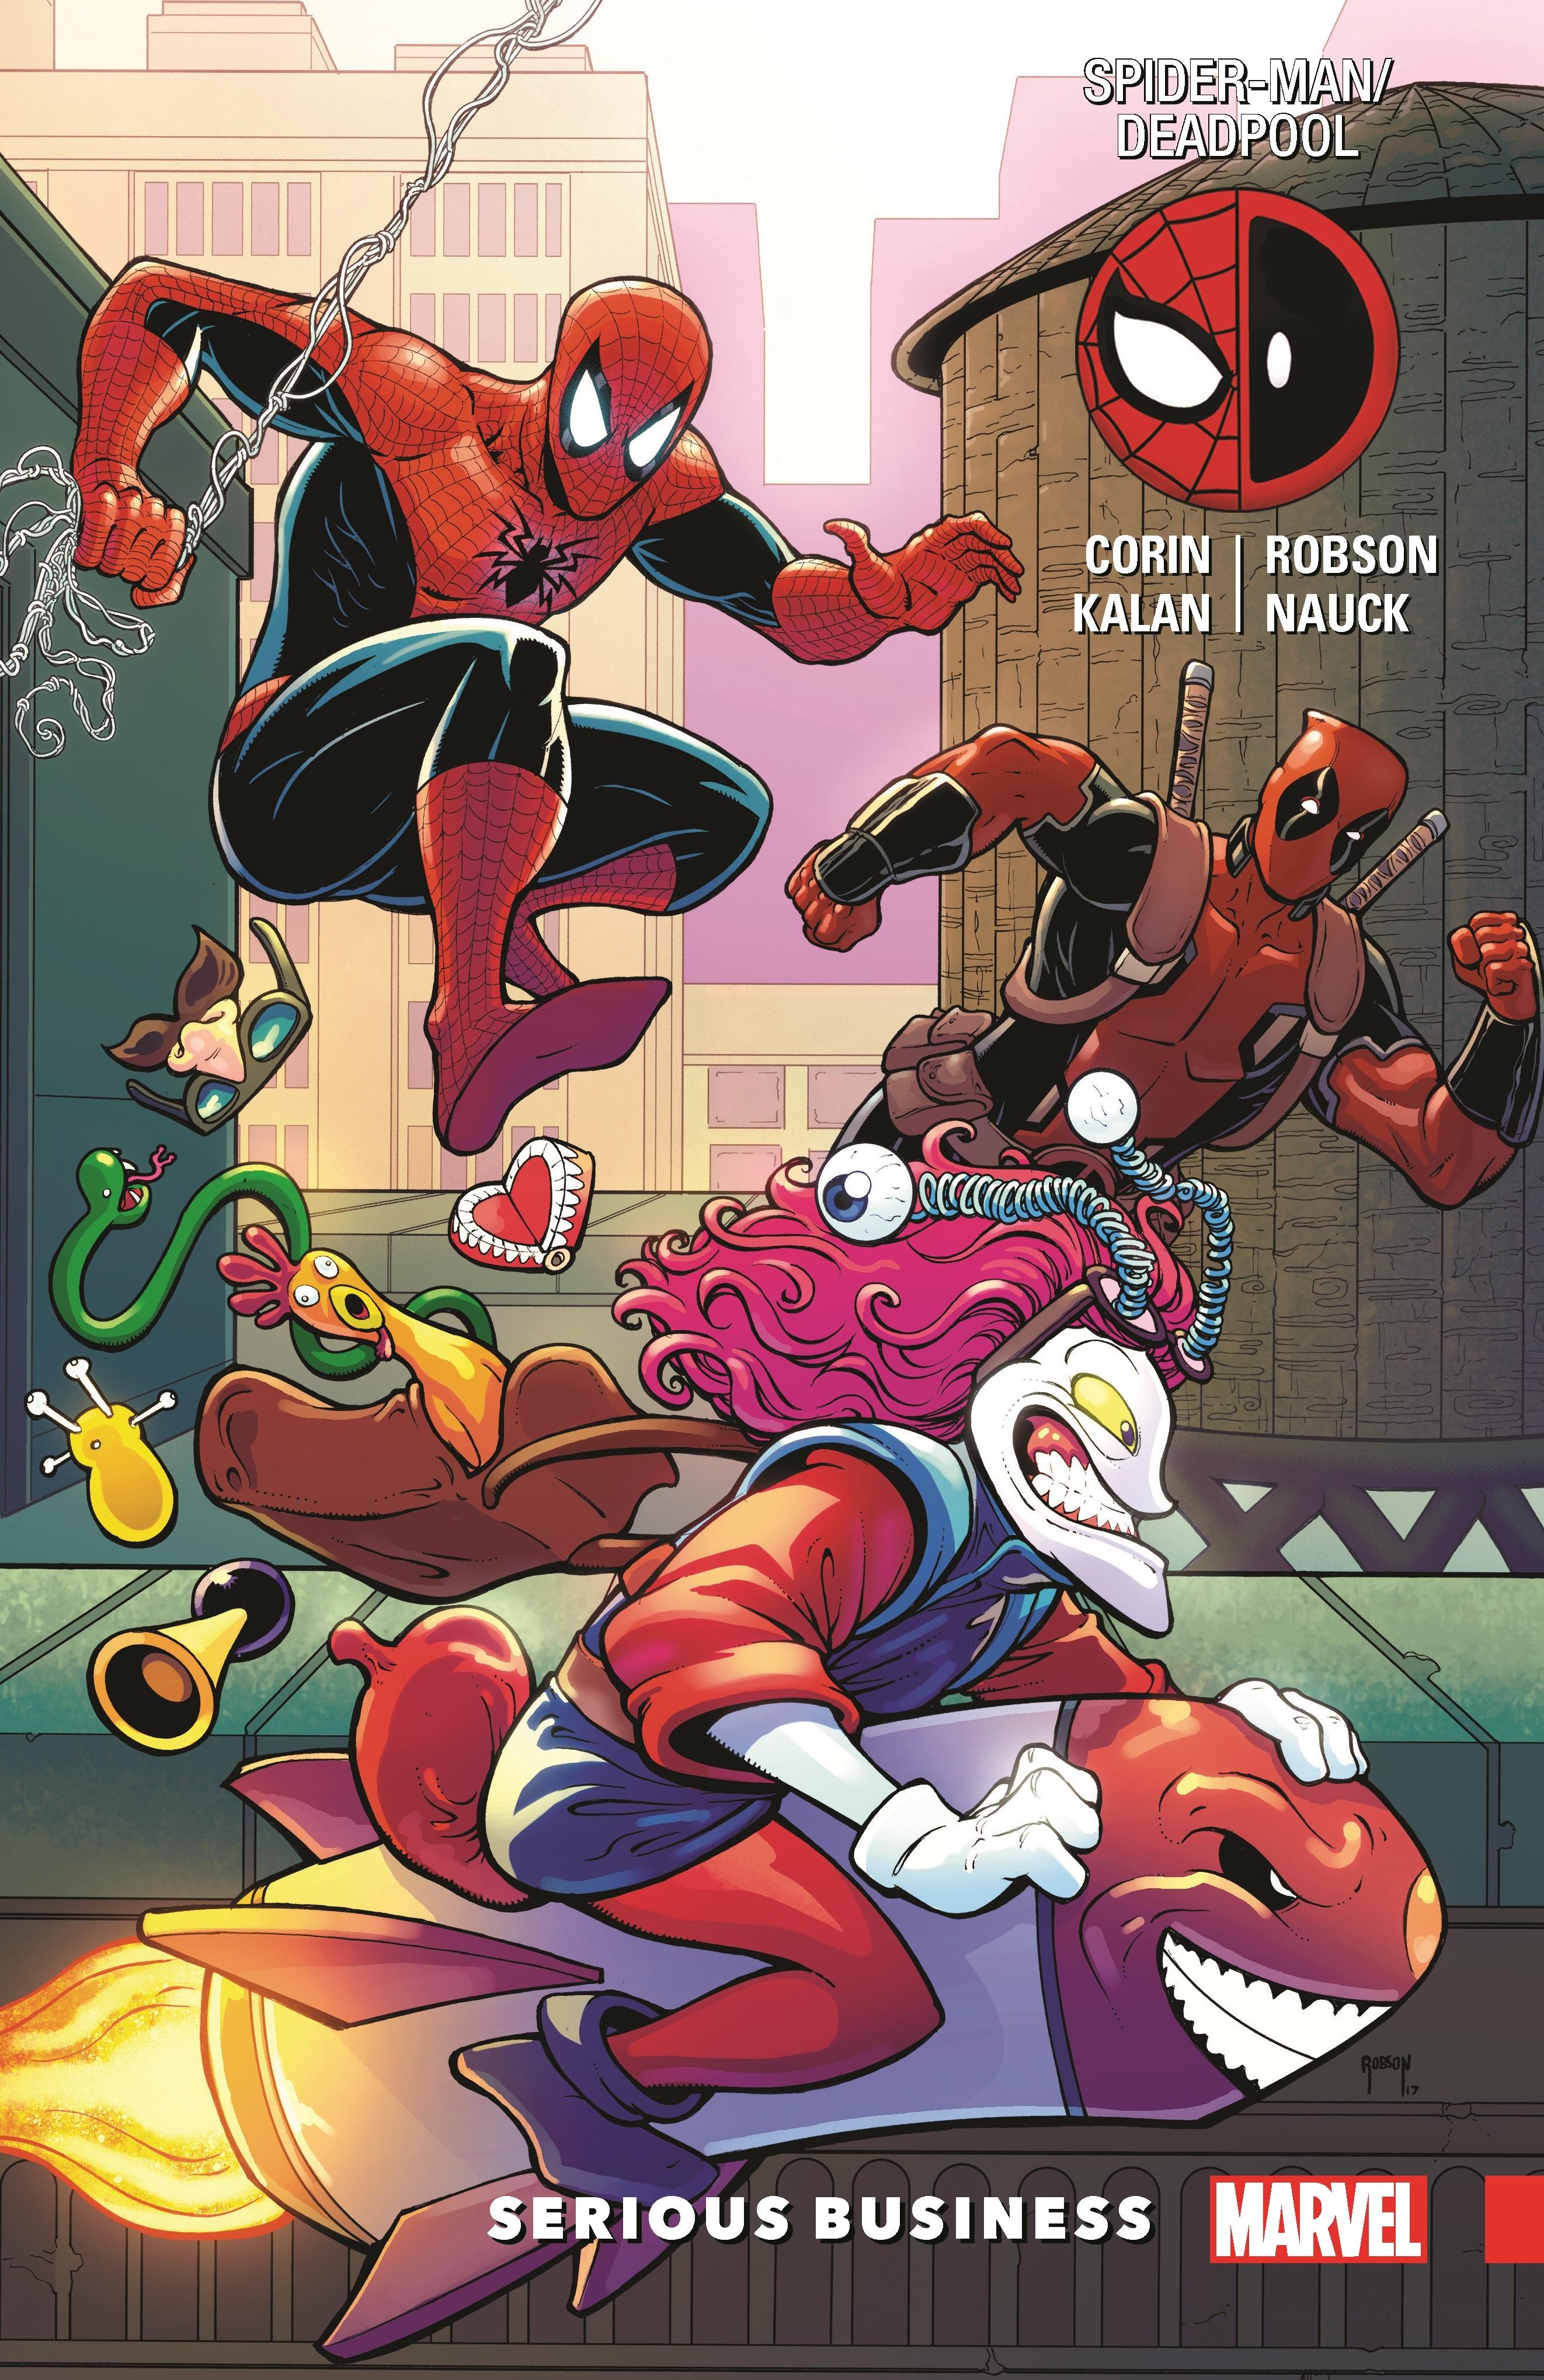 Spider-Man/Deadpool Vol. 4: Serious Business (Trade Paperback)